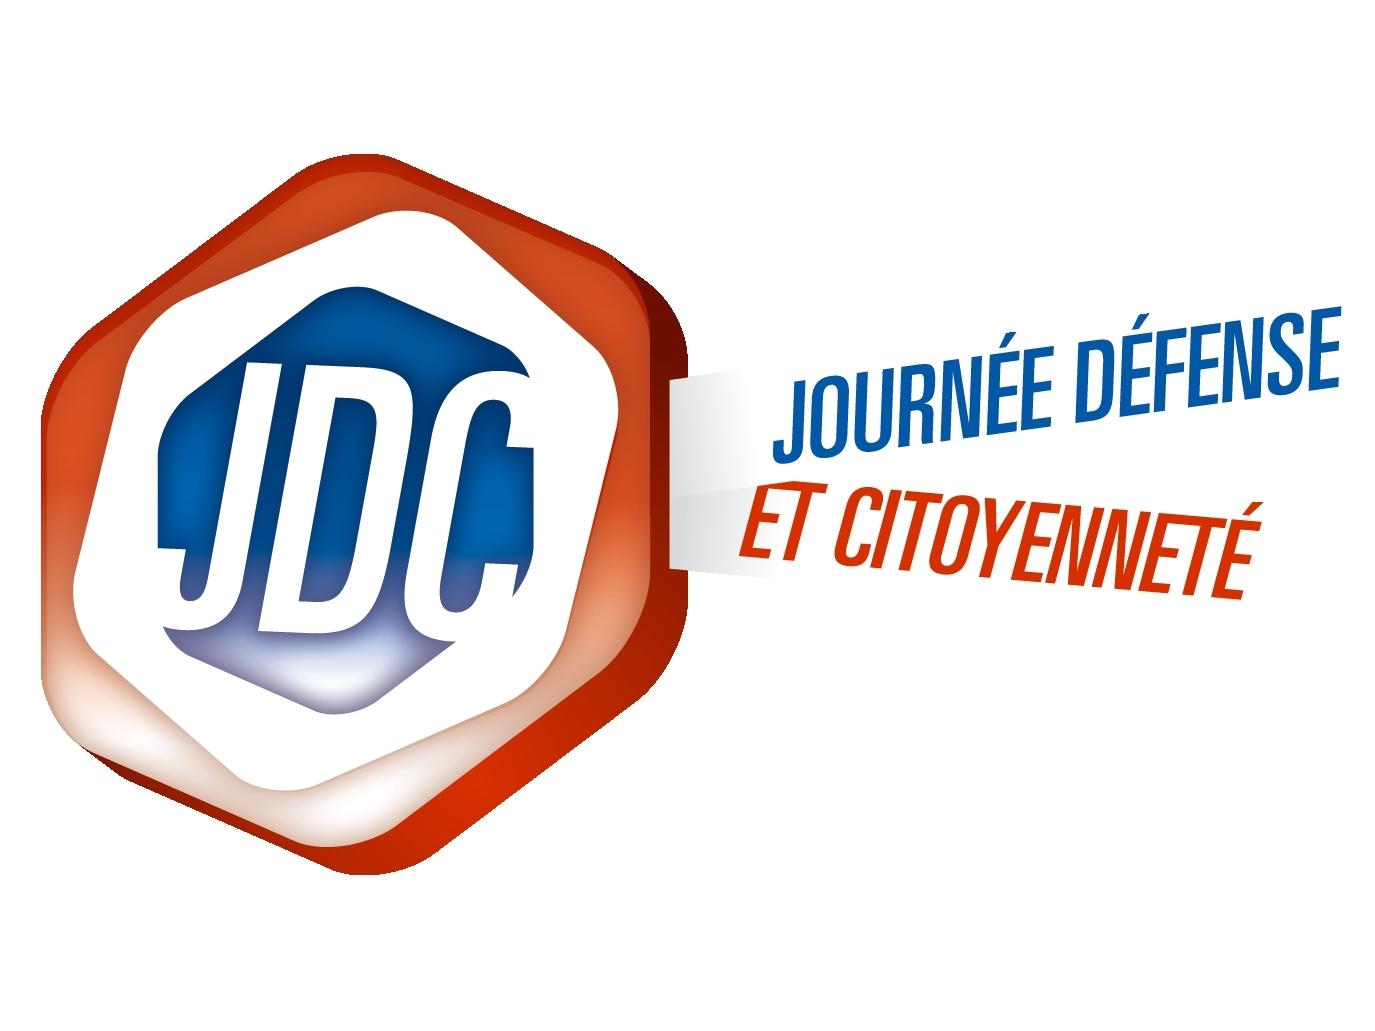 Logo Journée Défense et Citoyenneté.jpg